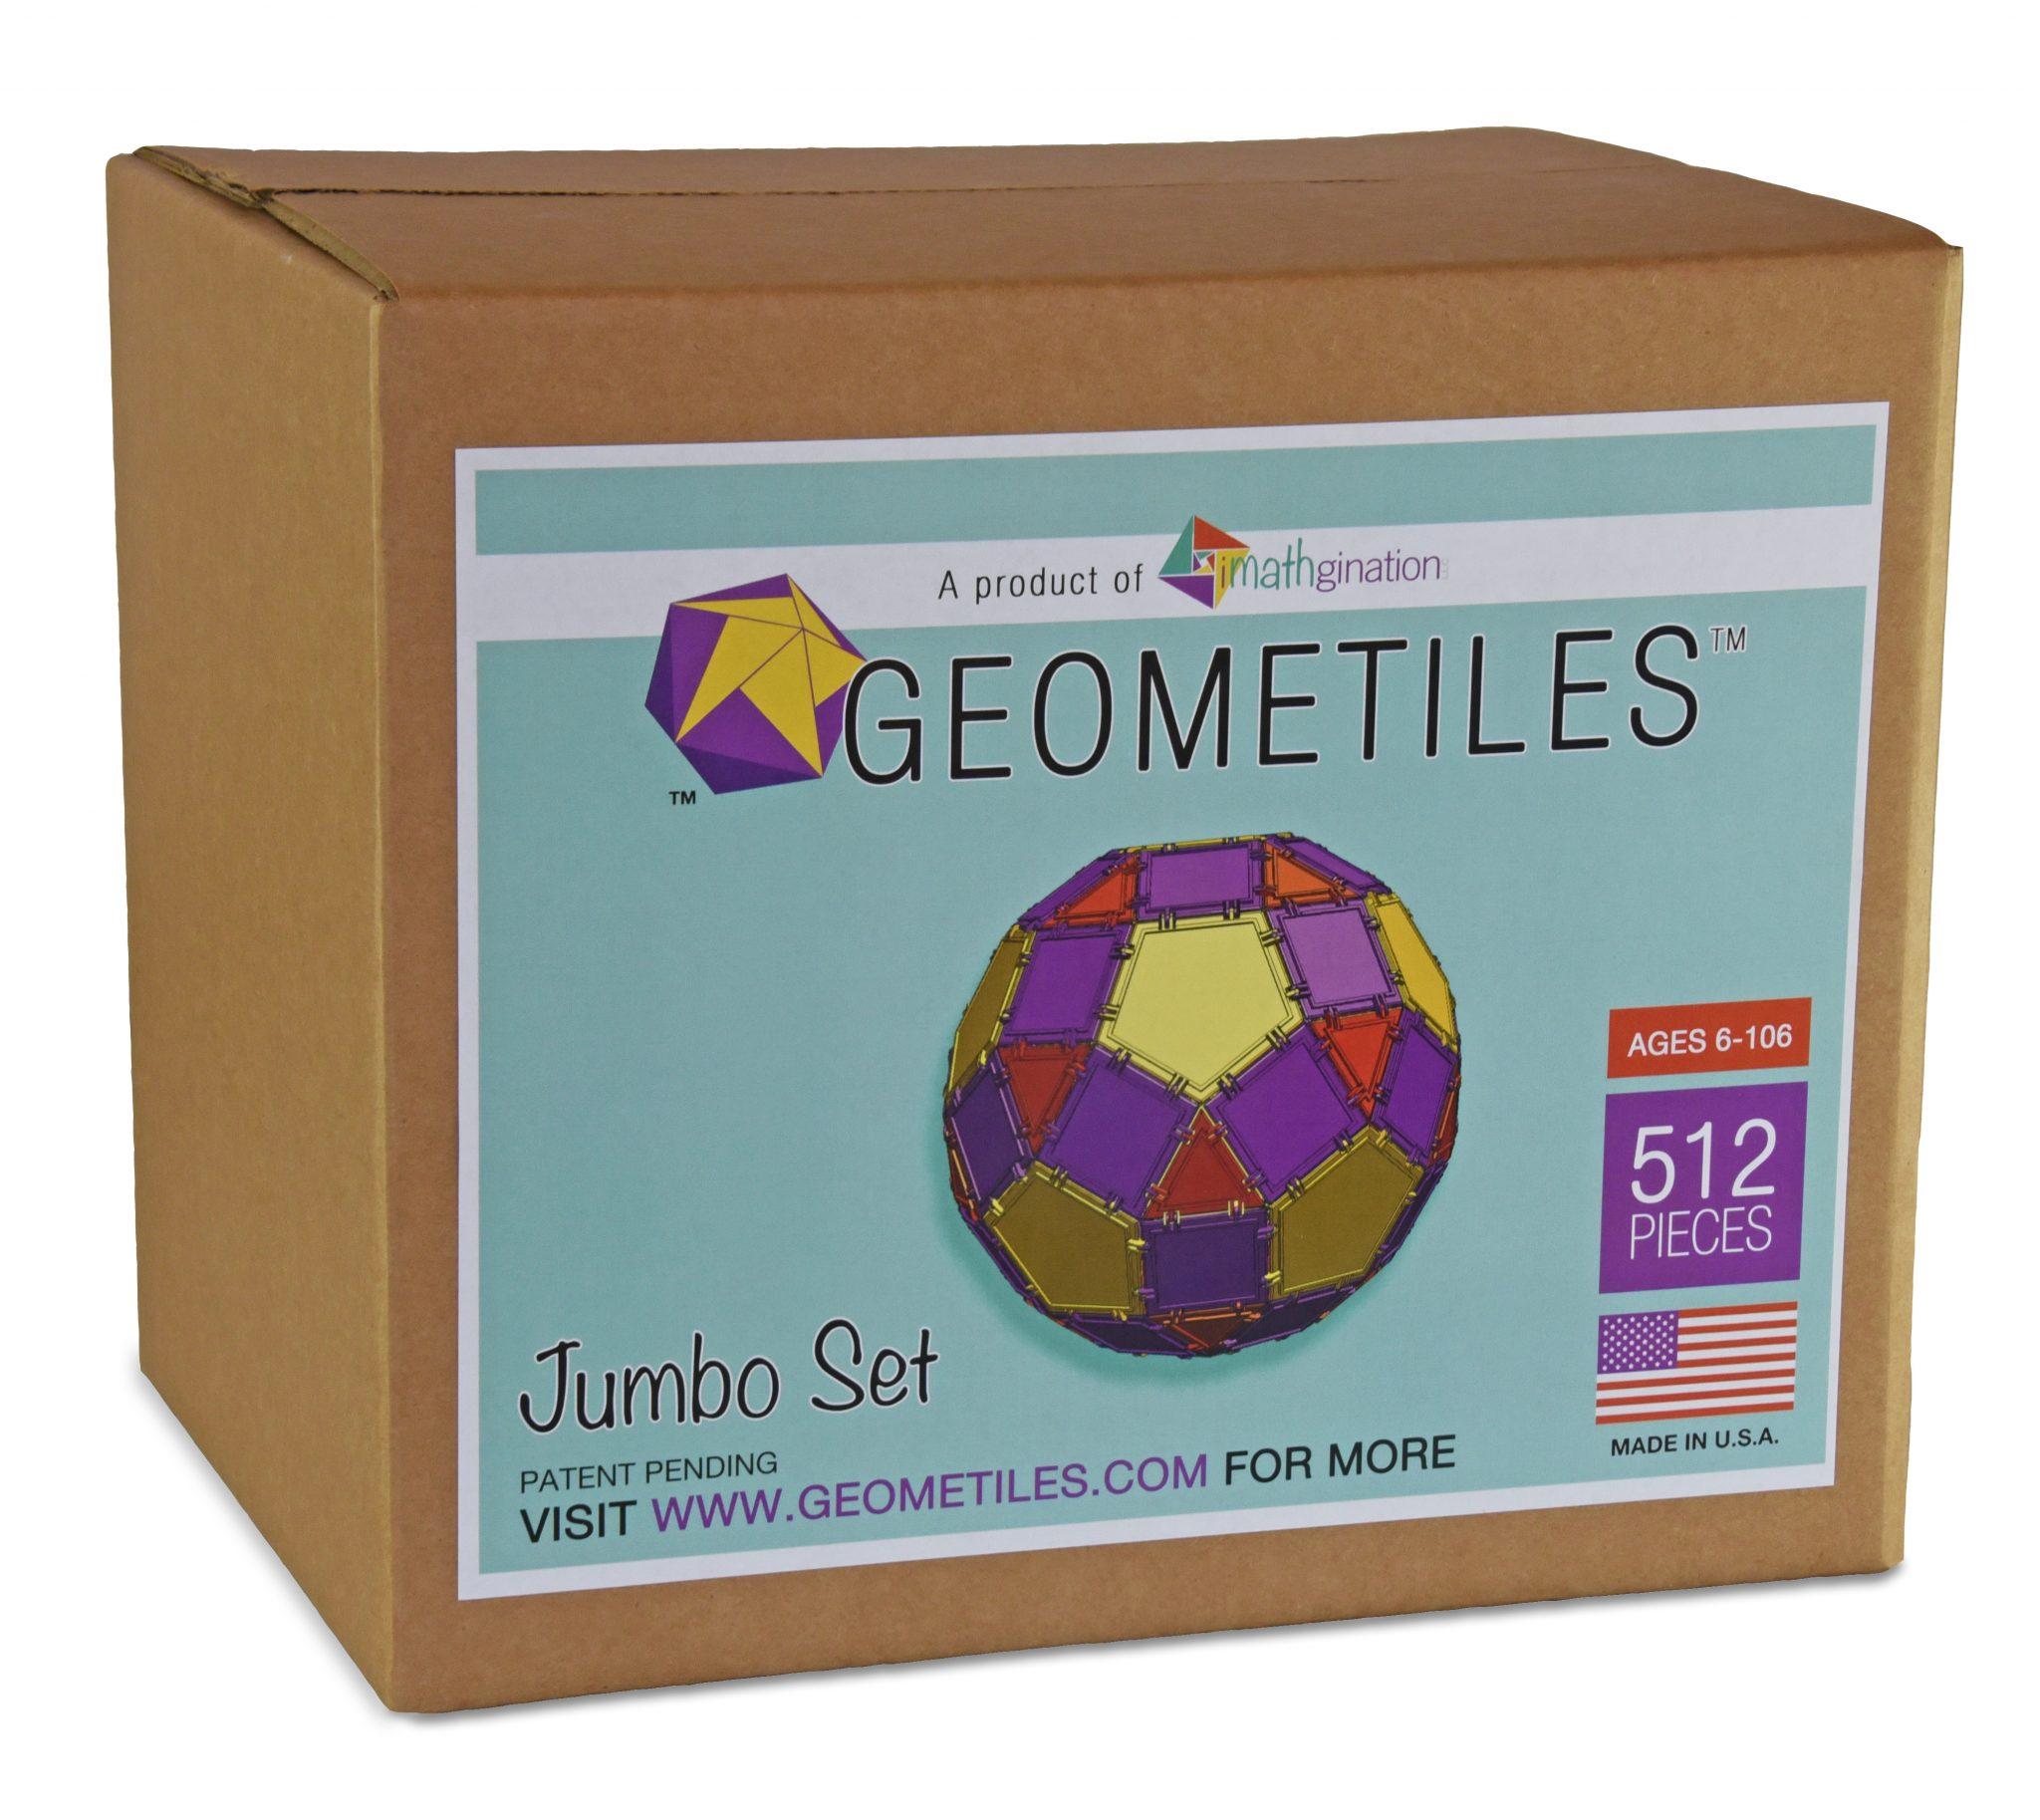 box of the jumbo 512 piece set